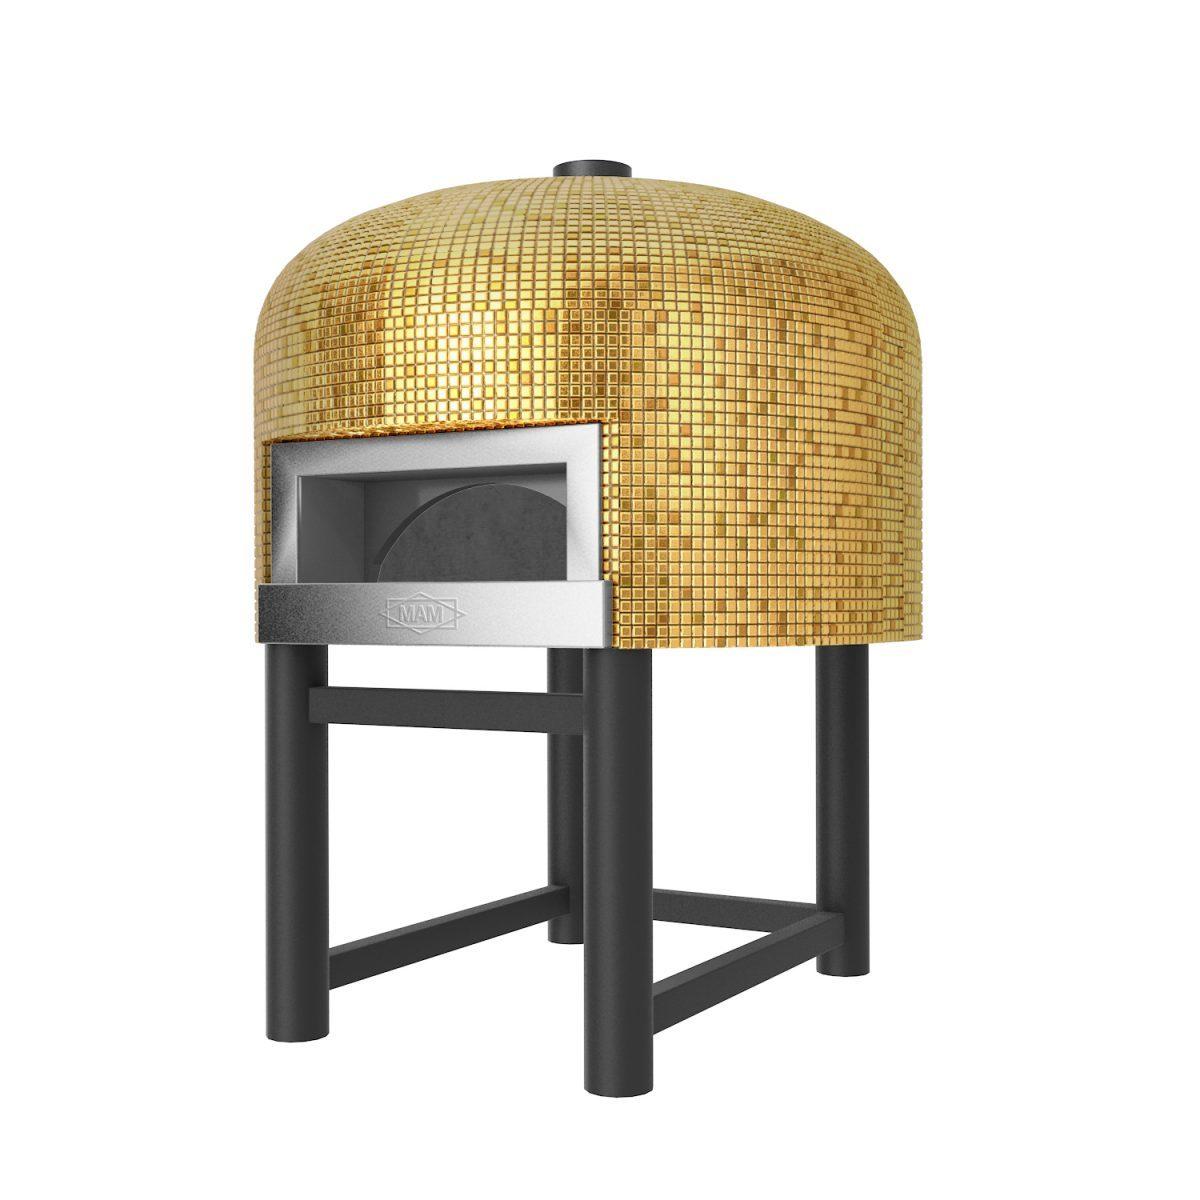 Steenoven Pizzaoven Napoli goud